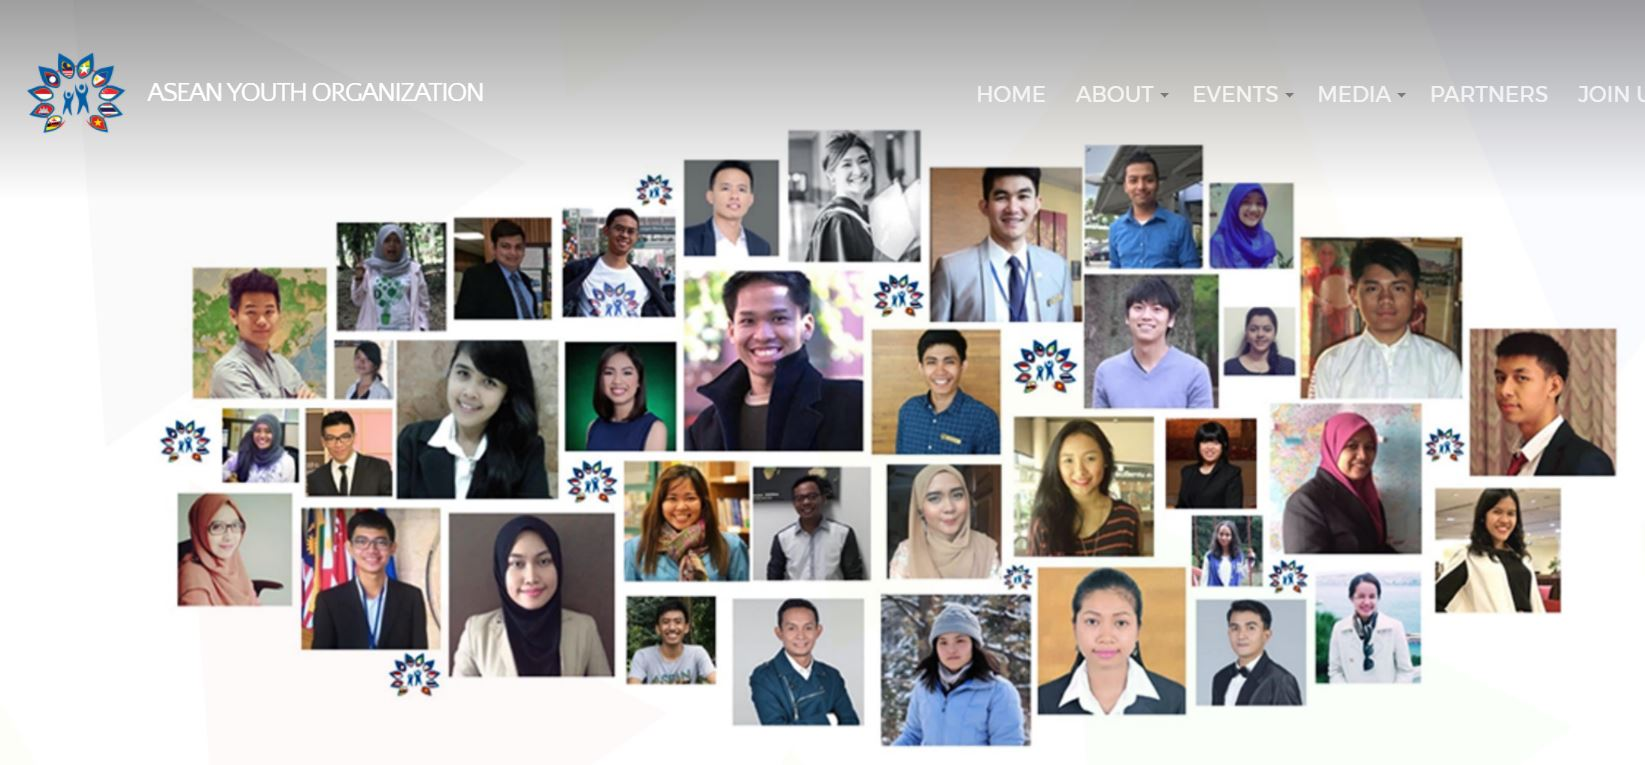 asean youth organization